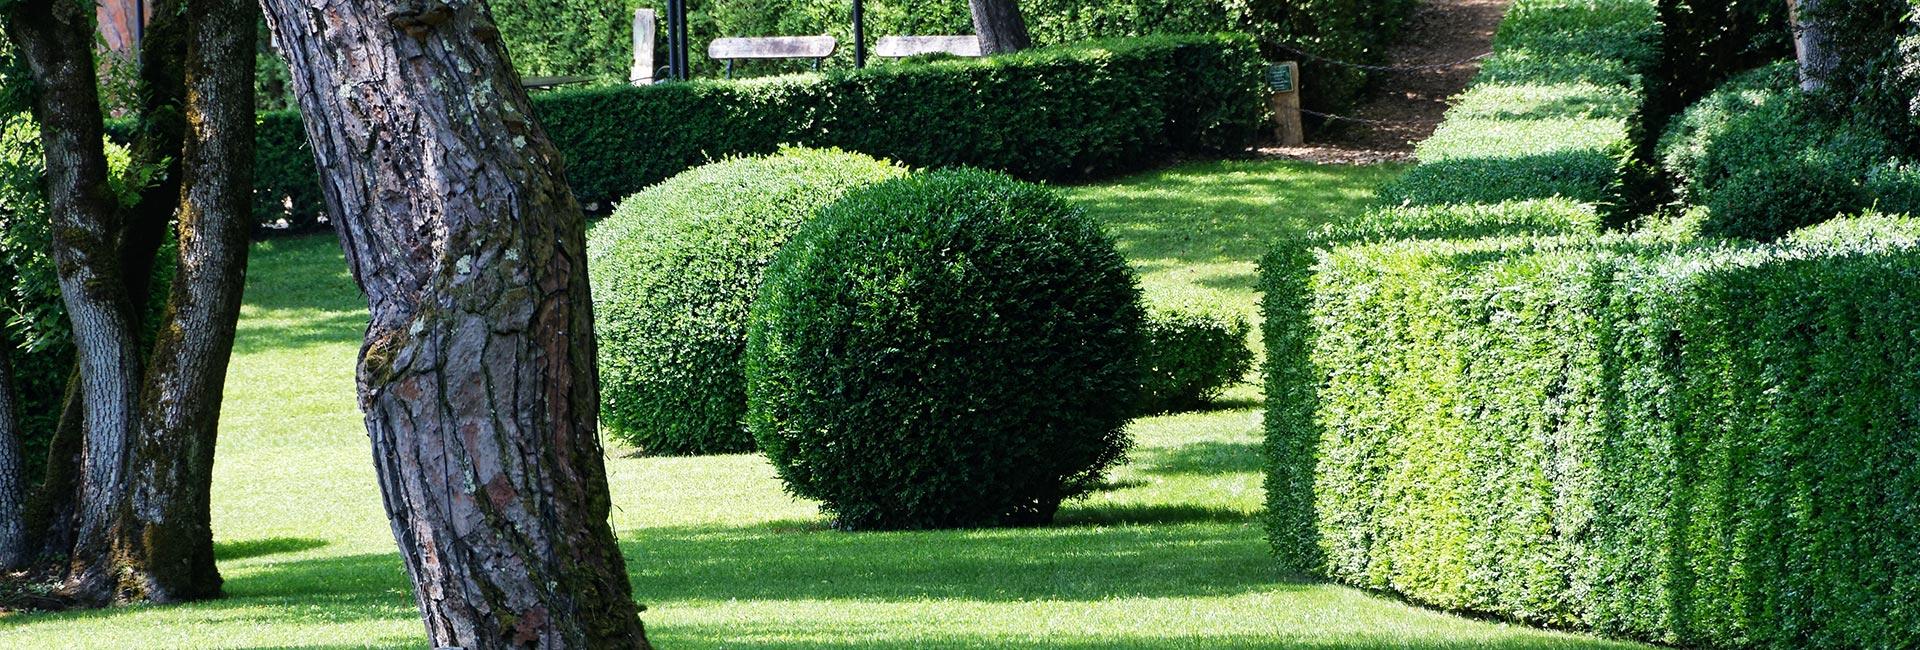 Réussir à bien entretenir un jardin